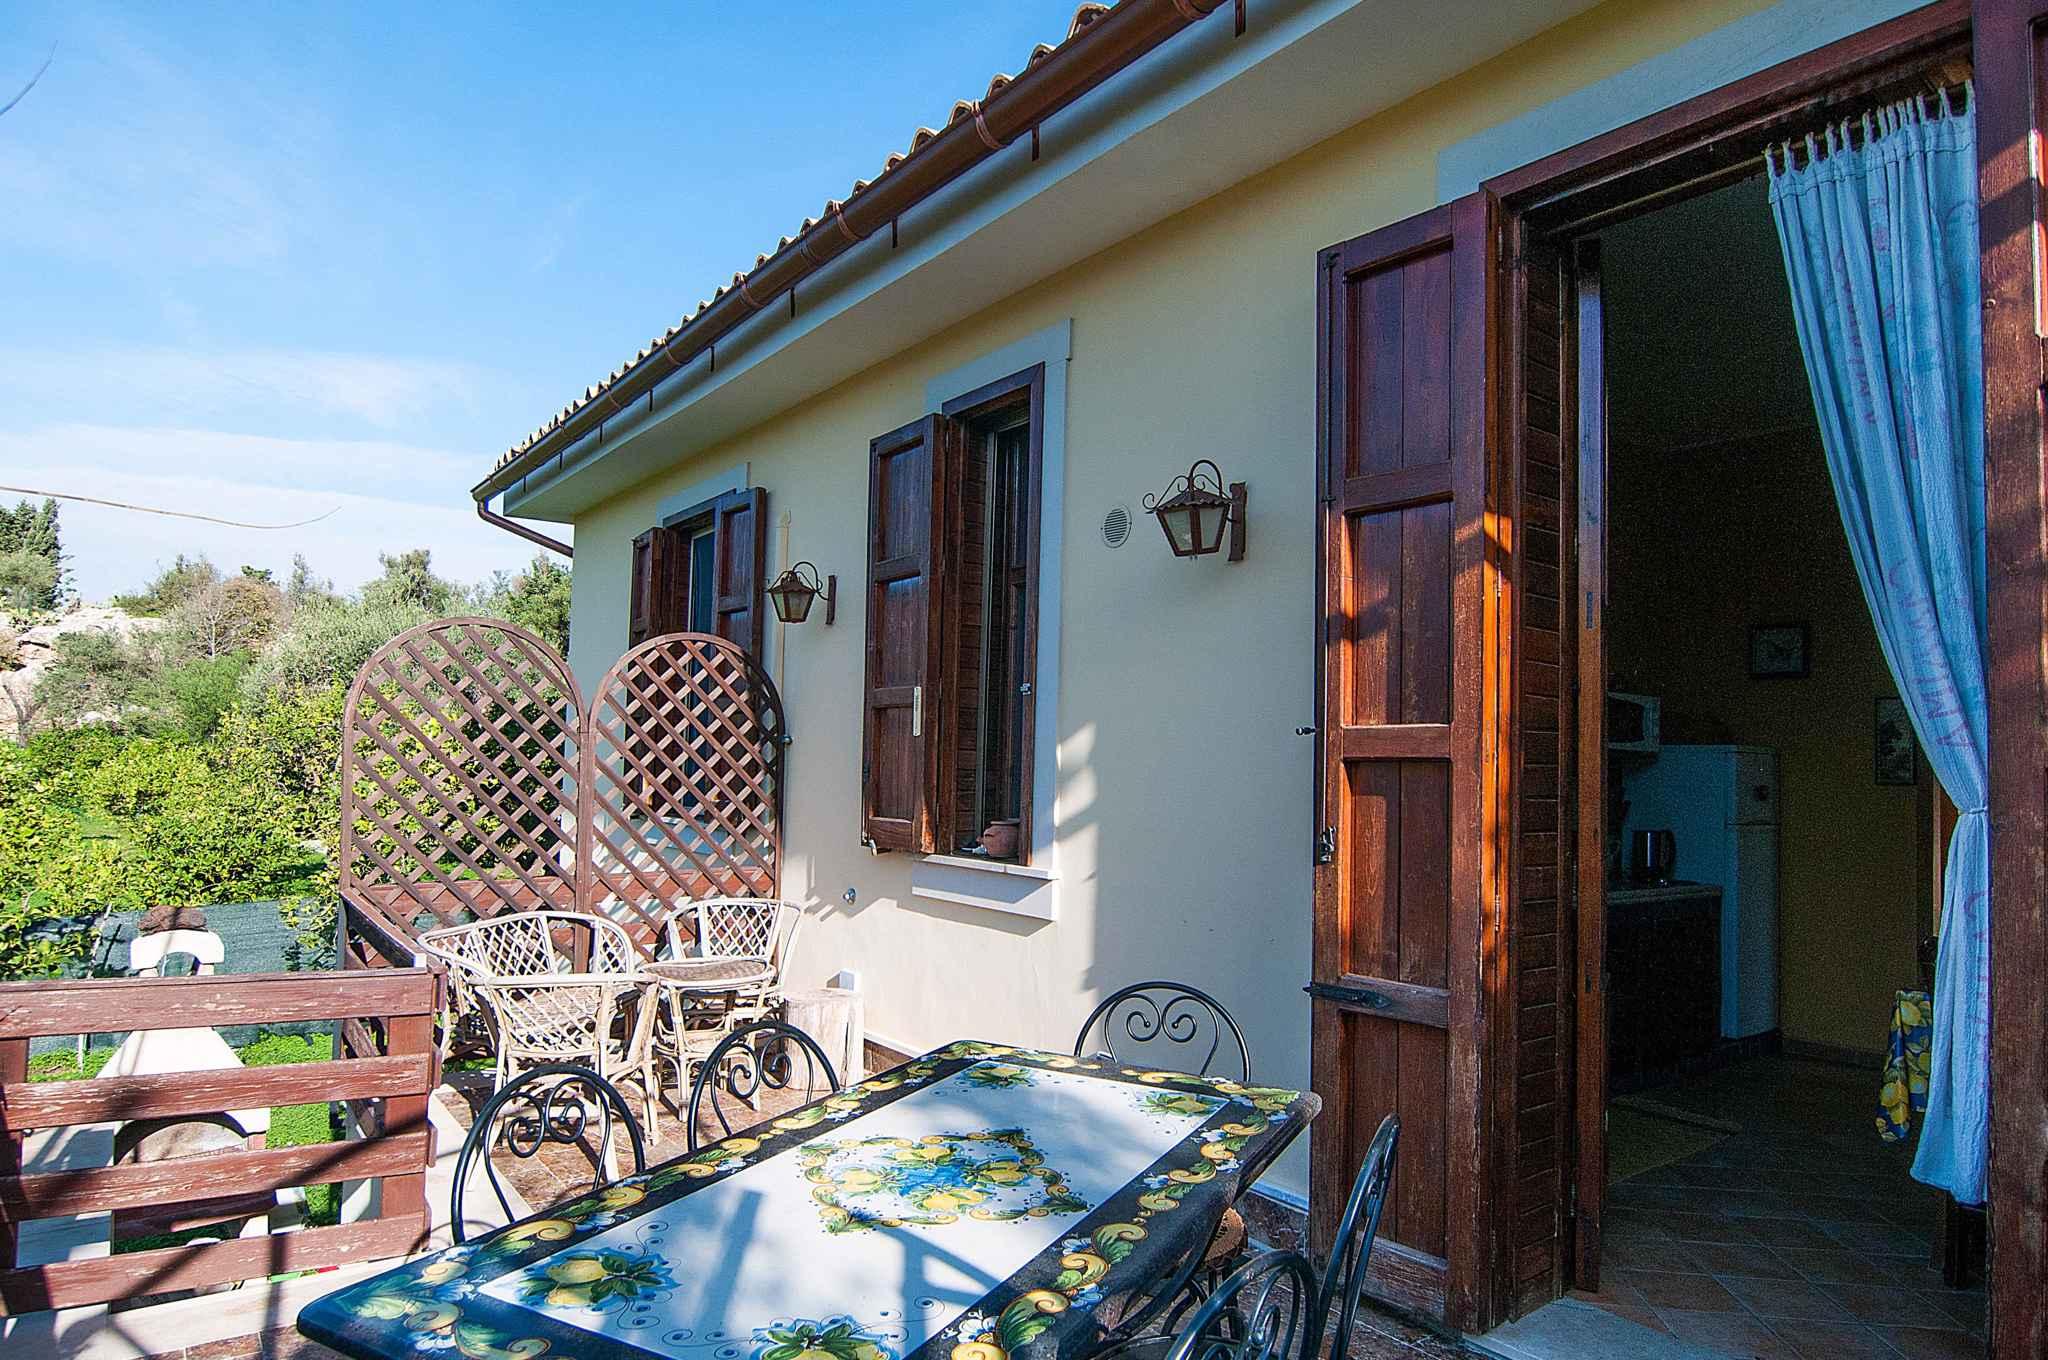 Maison de vacances mit Blick auf Zitronengarten (317534), Lido di Noto, Siracusa, Sicile, Italie, image 1